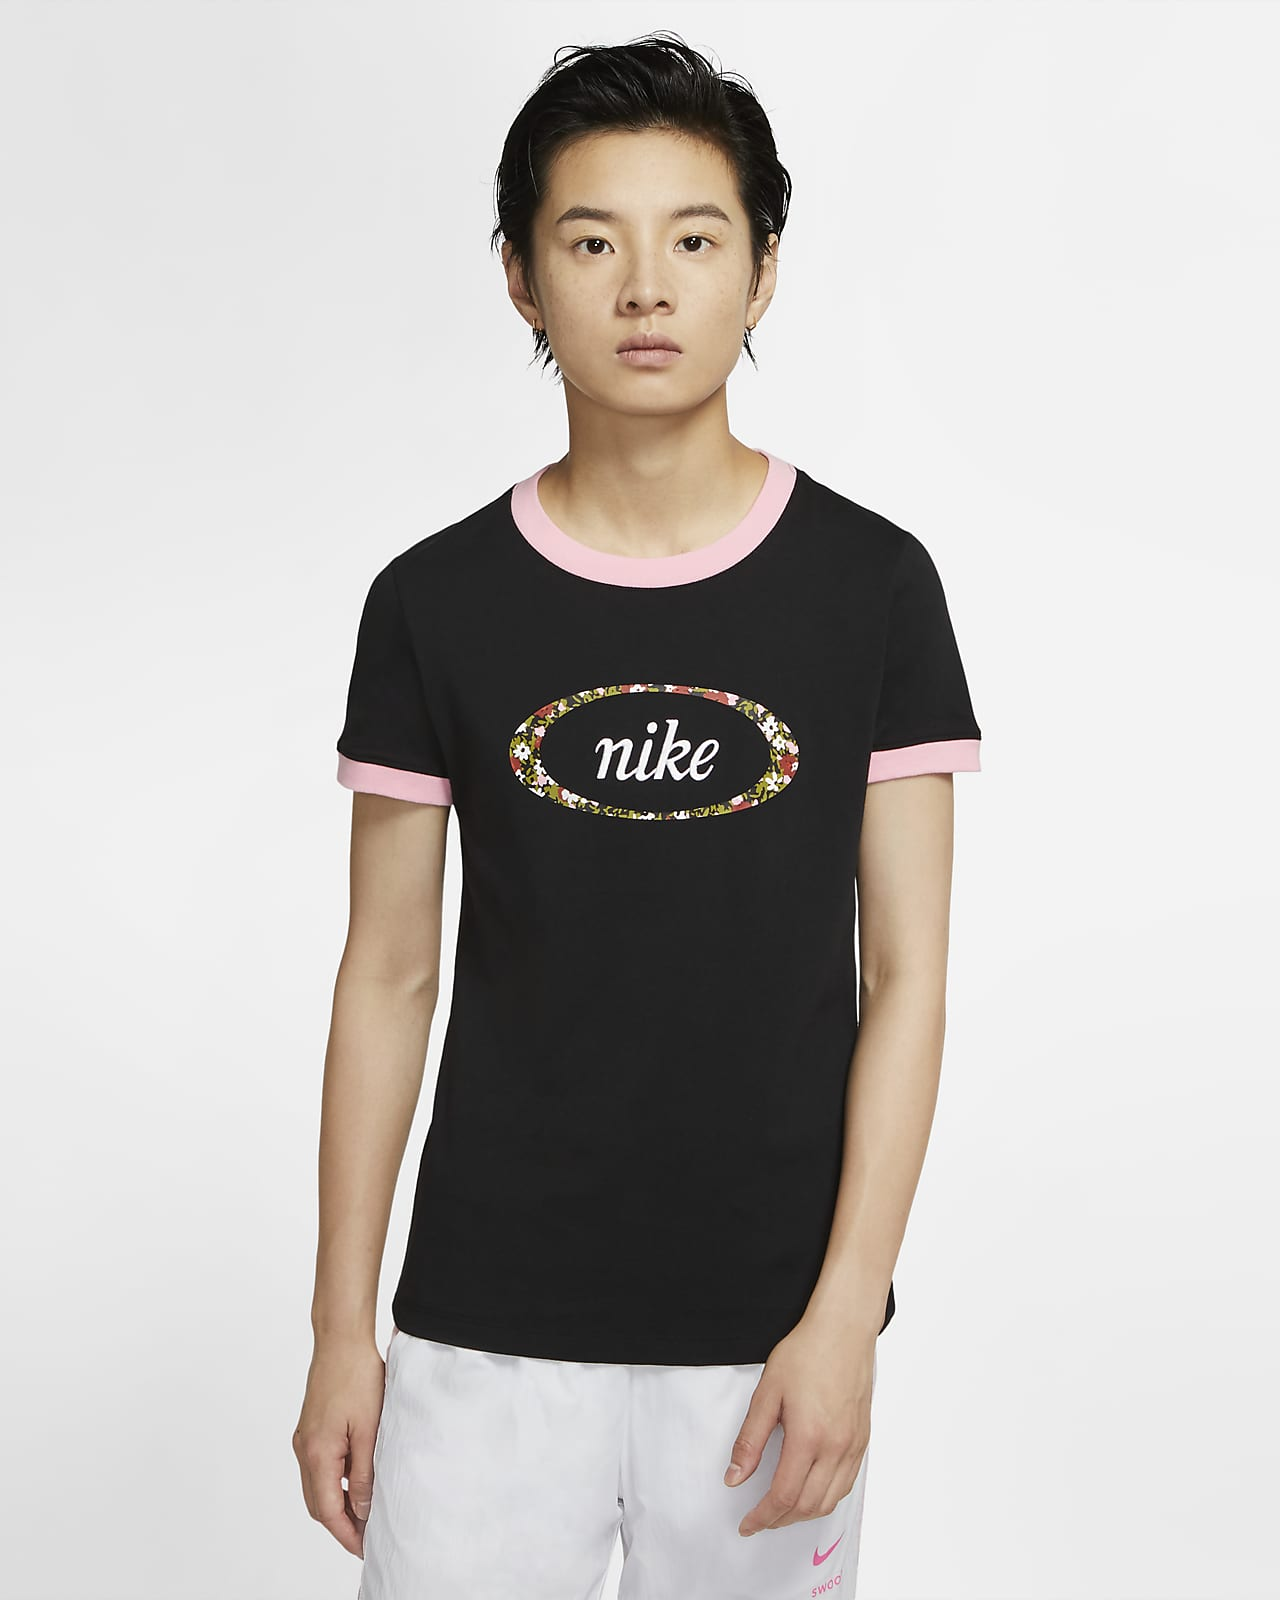 Nike Sportswear Femme Women's Ringer T-Shirt